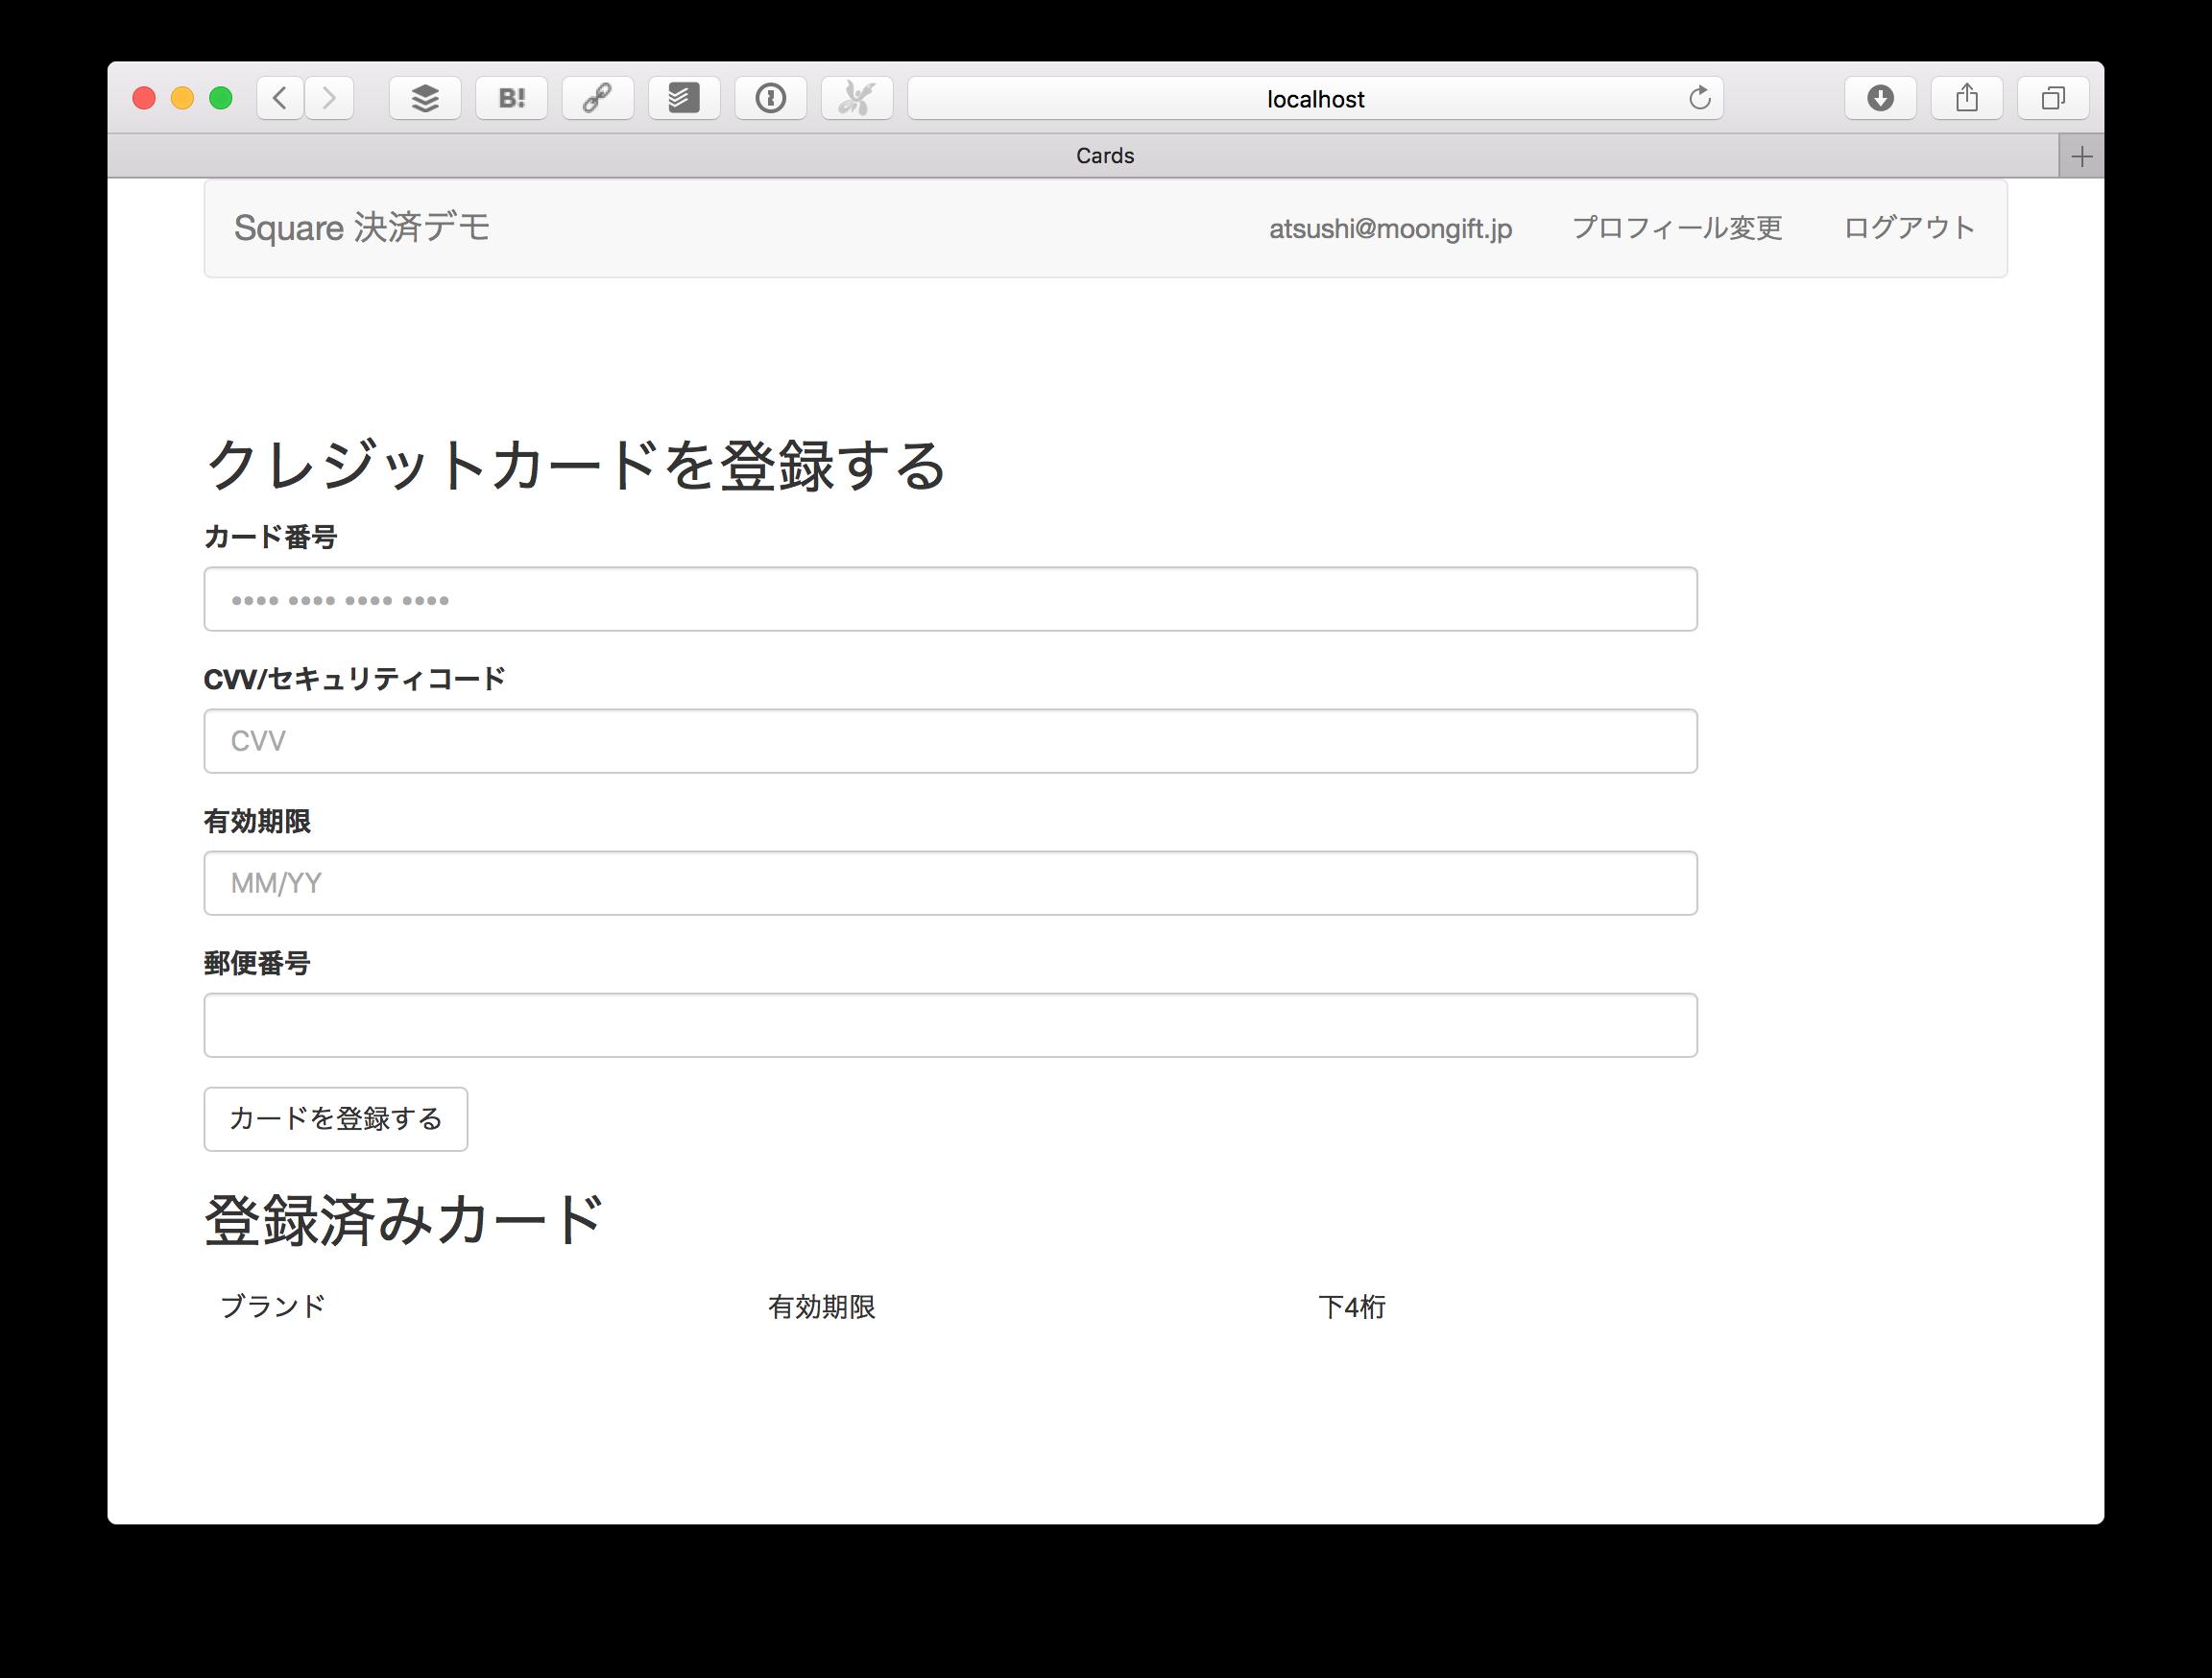 Screenshot_ 2017-11-23 14.40.03.png